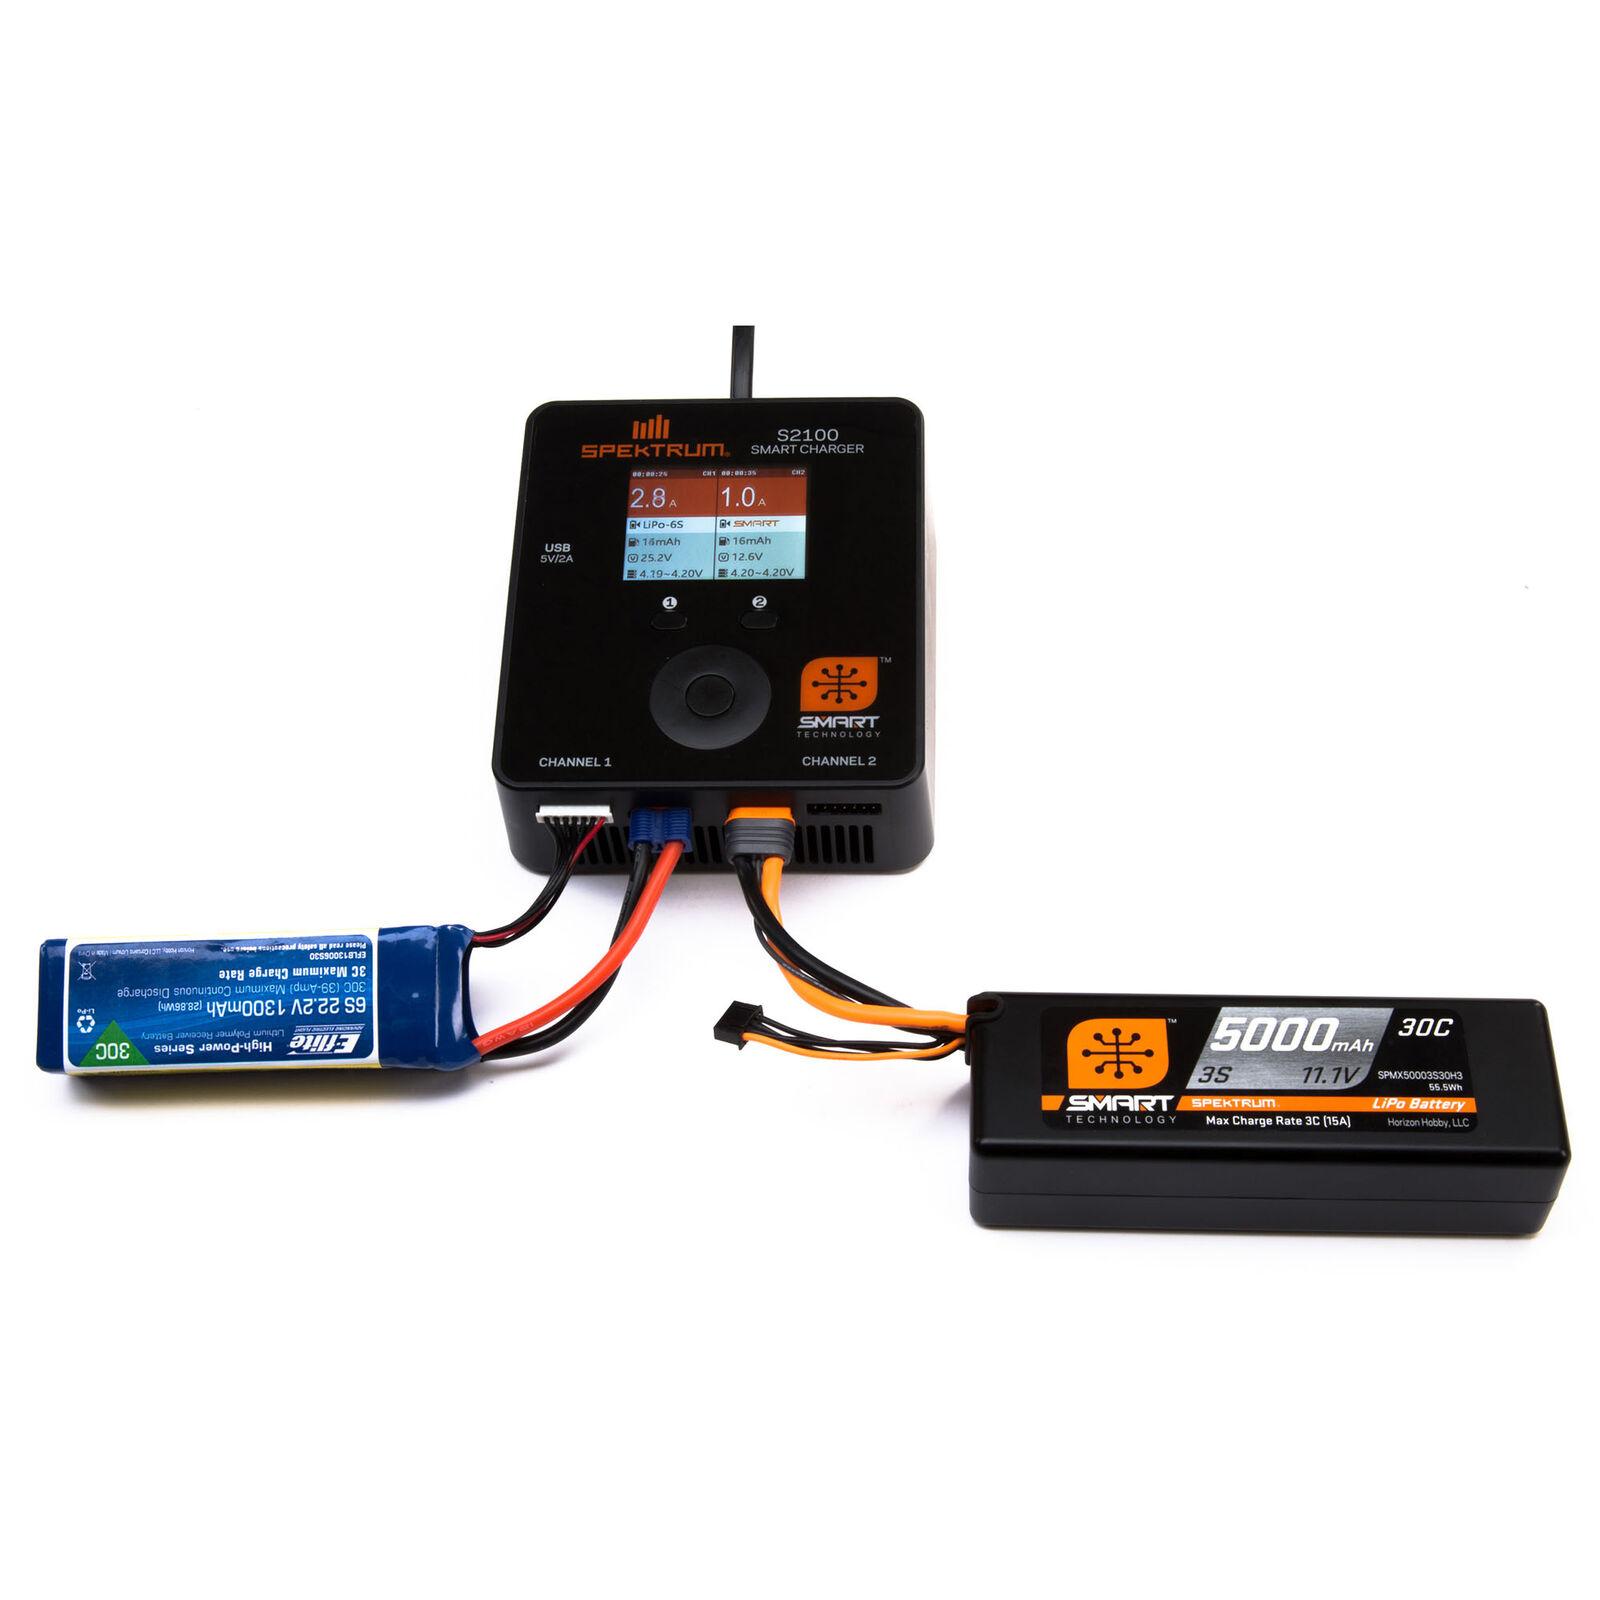 22.2V 3200mAh 6S 30C Smart LiPo Battery: IC5